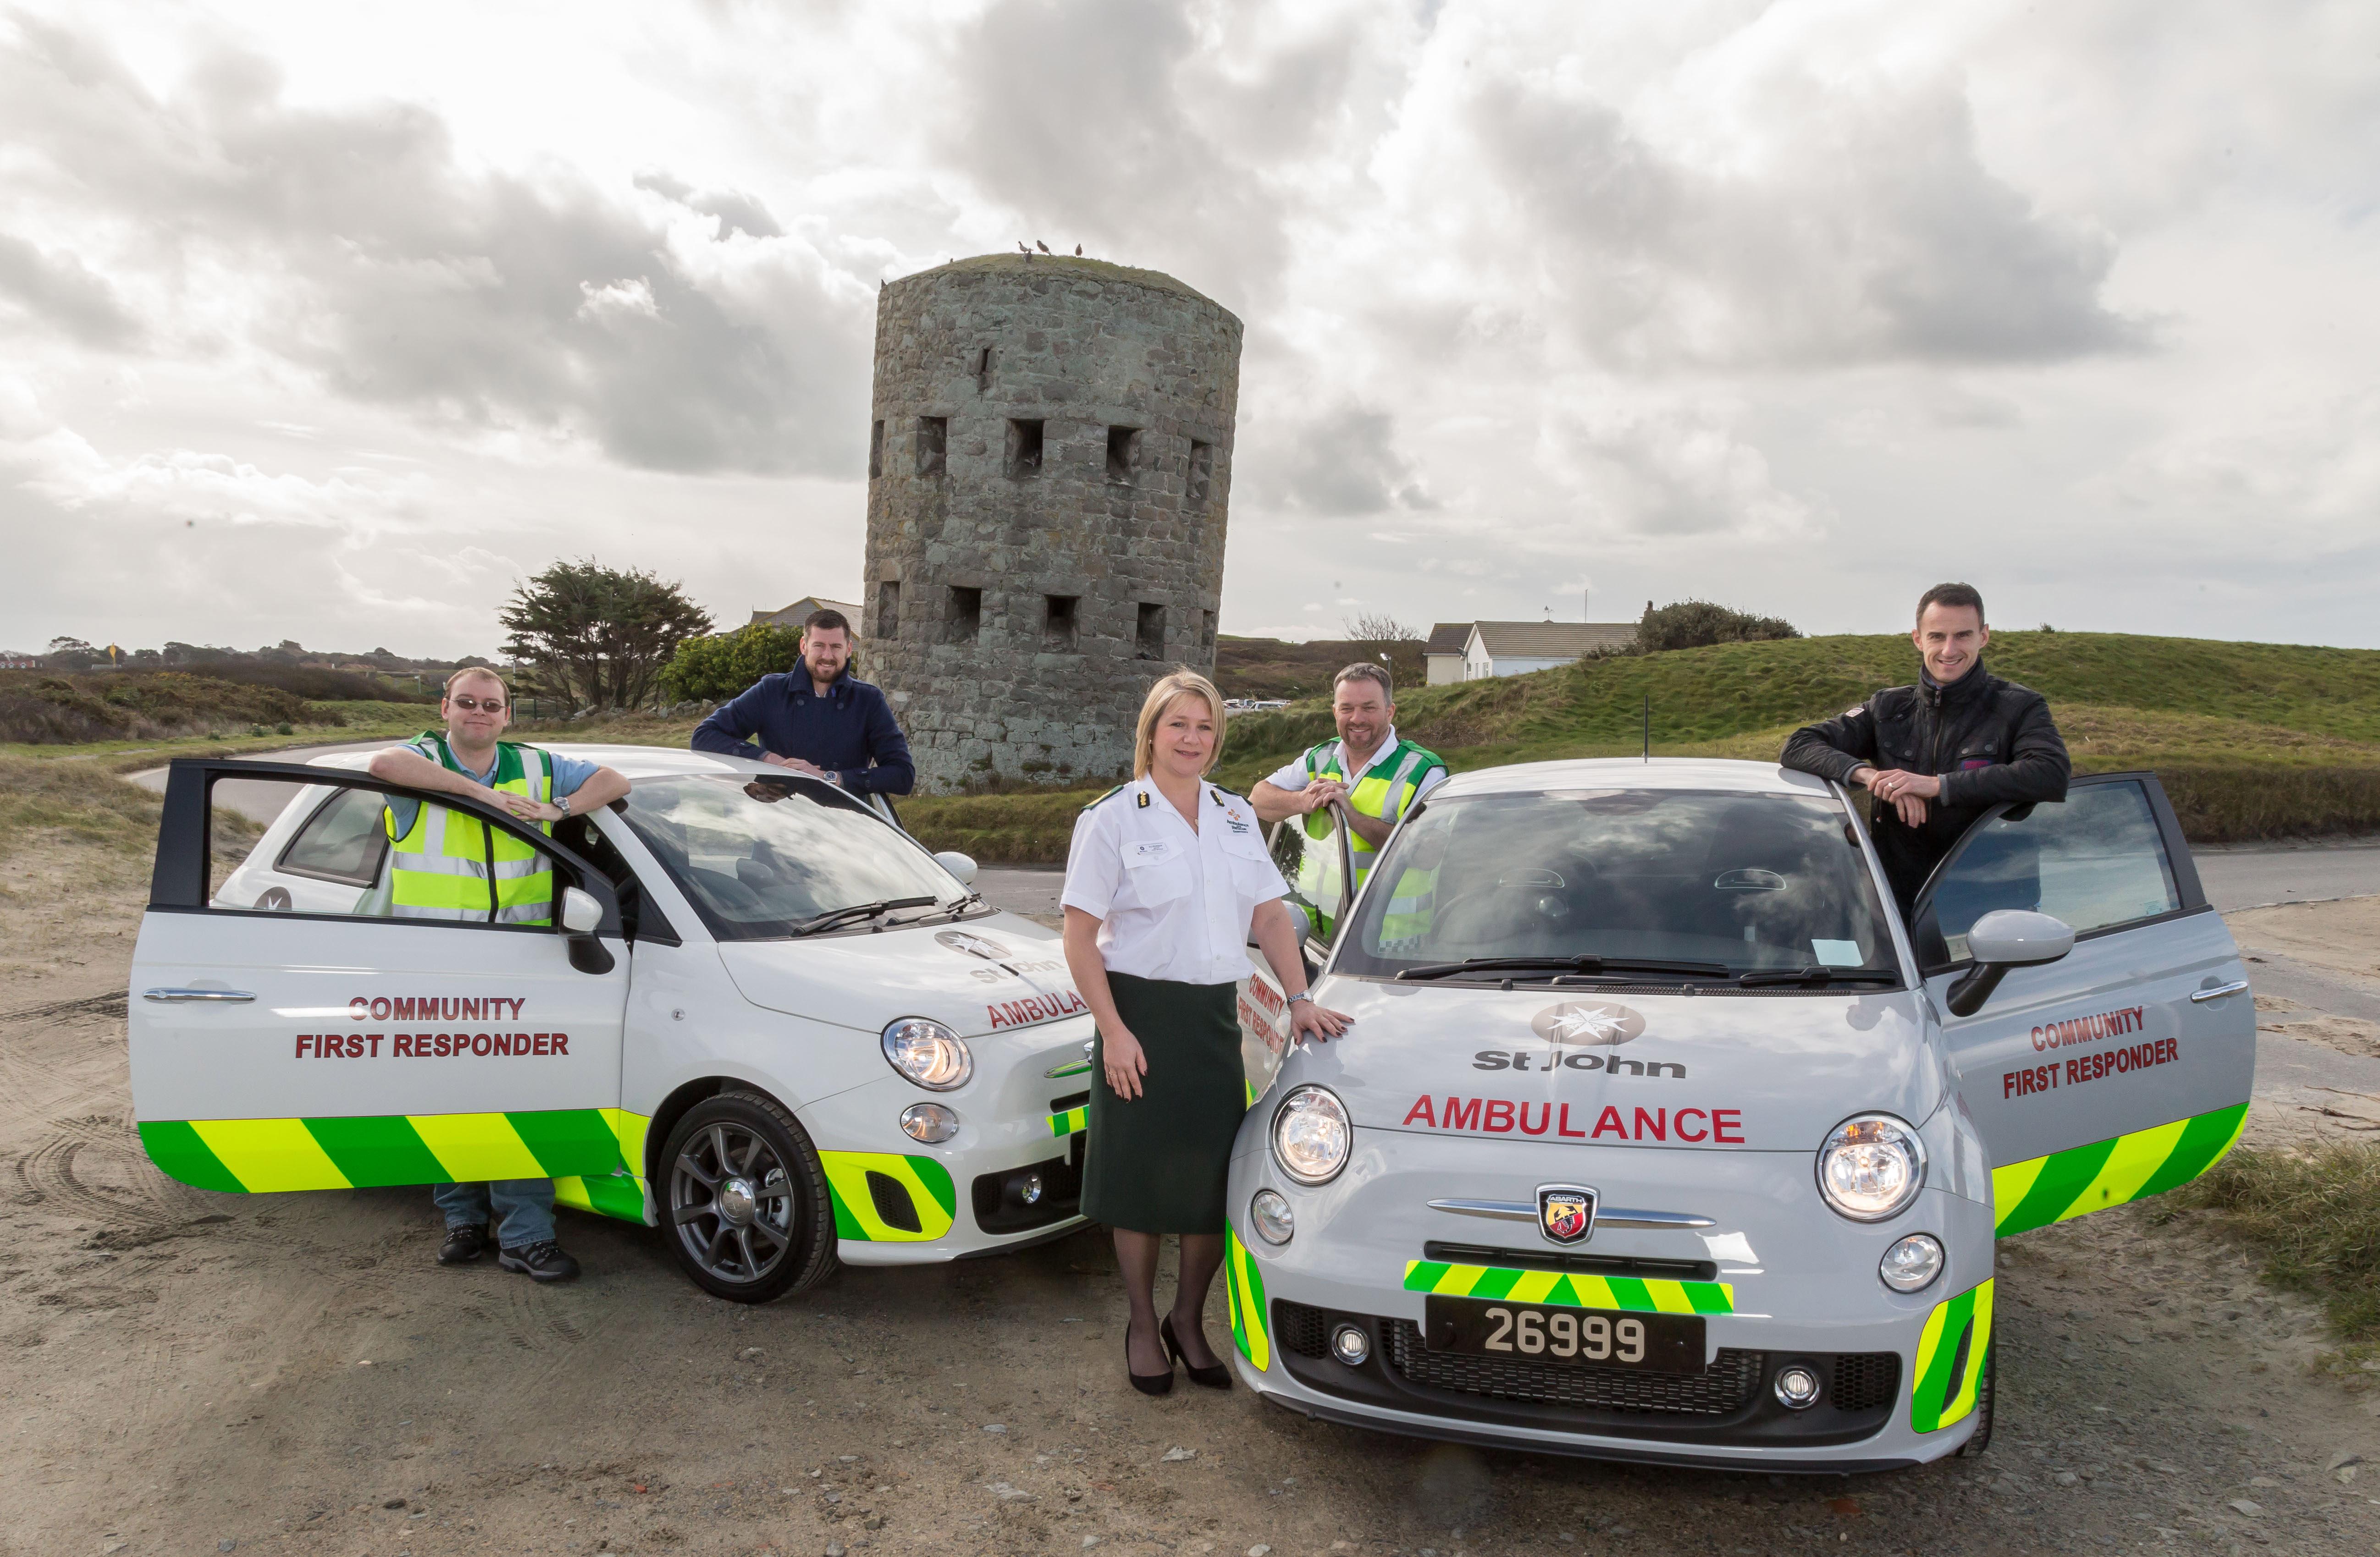 Le Mont Saint Garage - St John Ambulance - Community First Responder vehicles.